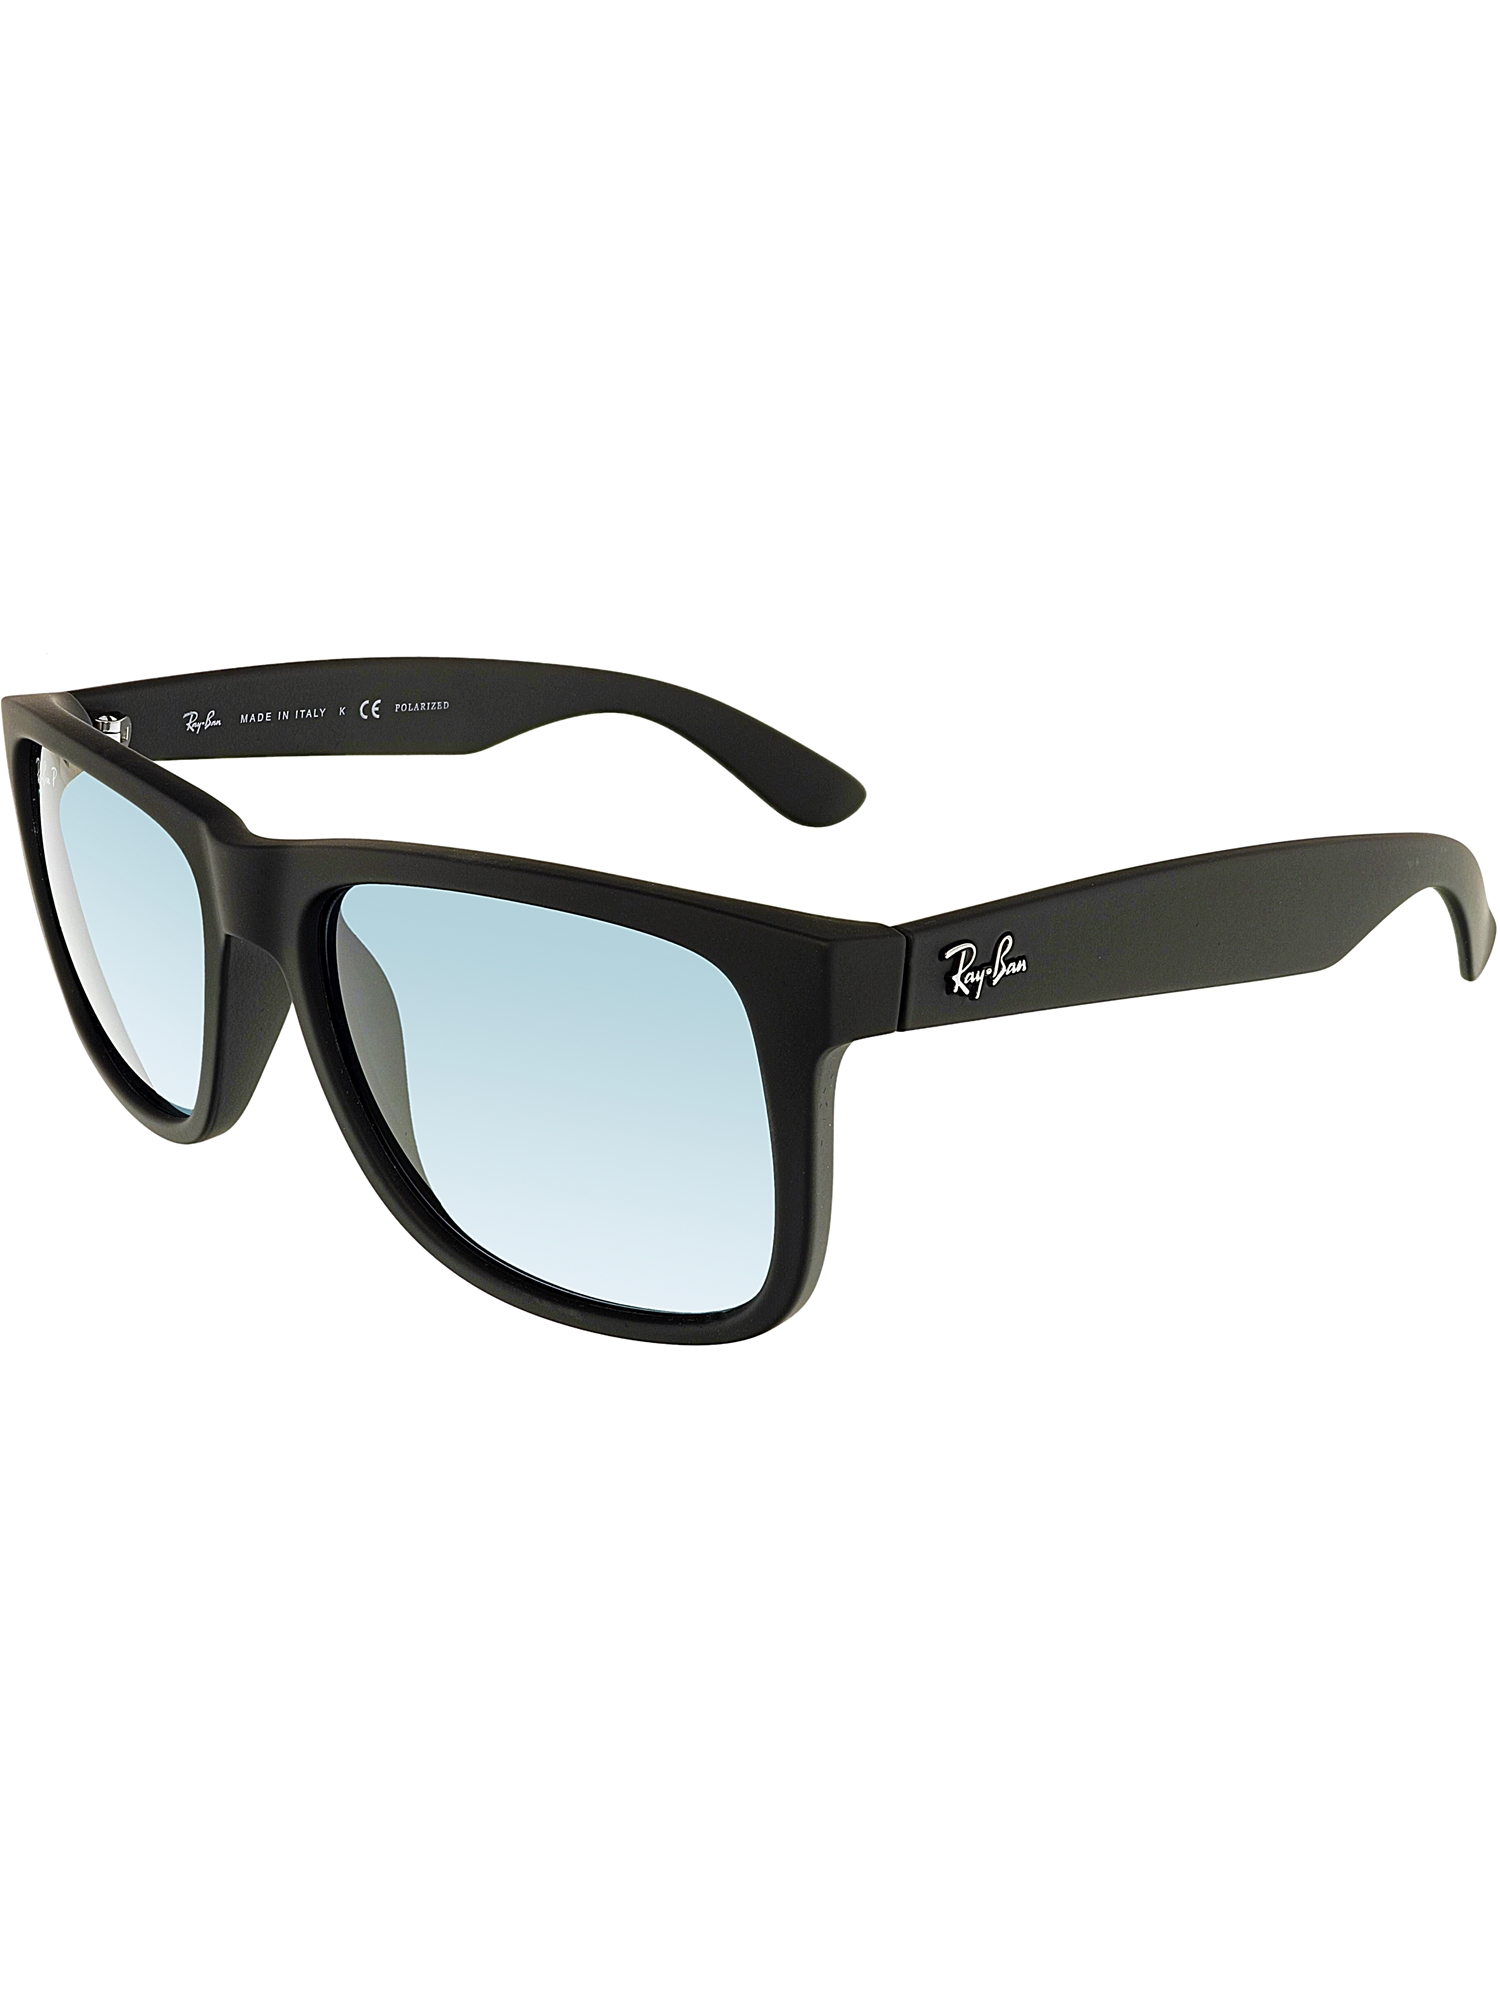 2c108246cf ... closeout ray ban justin polarized blue classic sunglasses rb4165 622 2v  55 8cb98 cf533